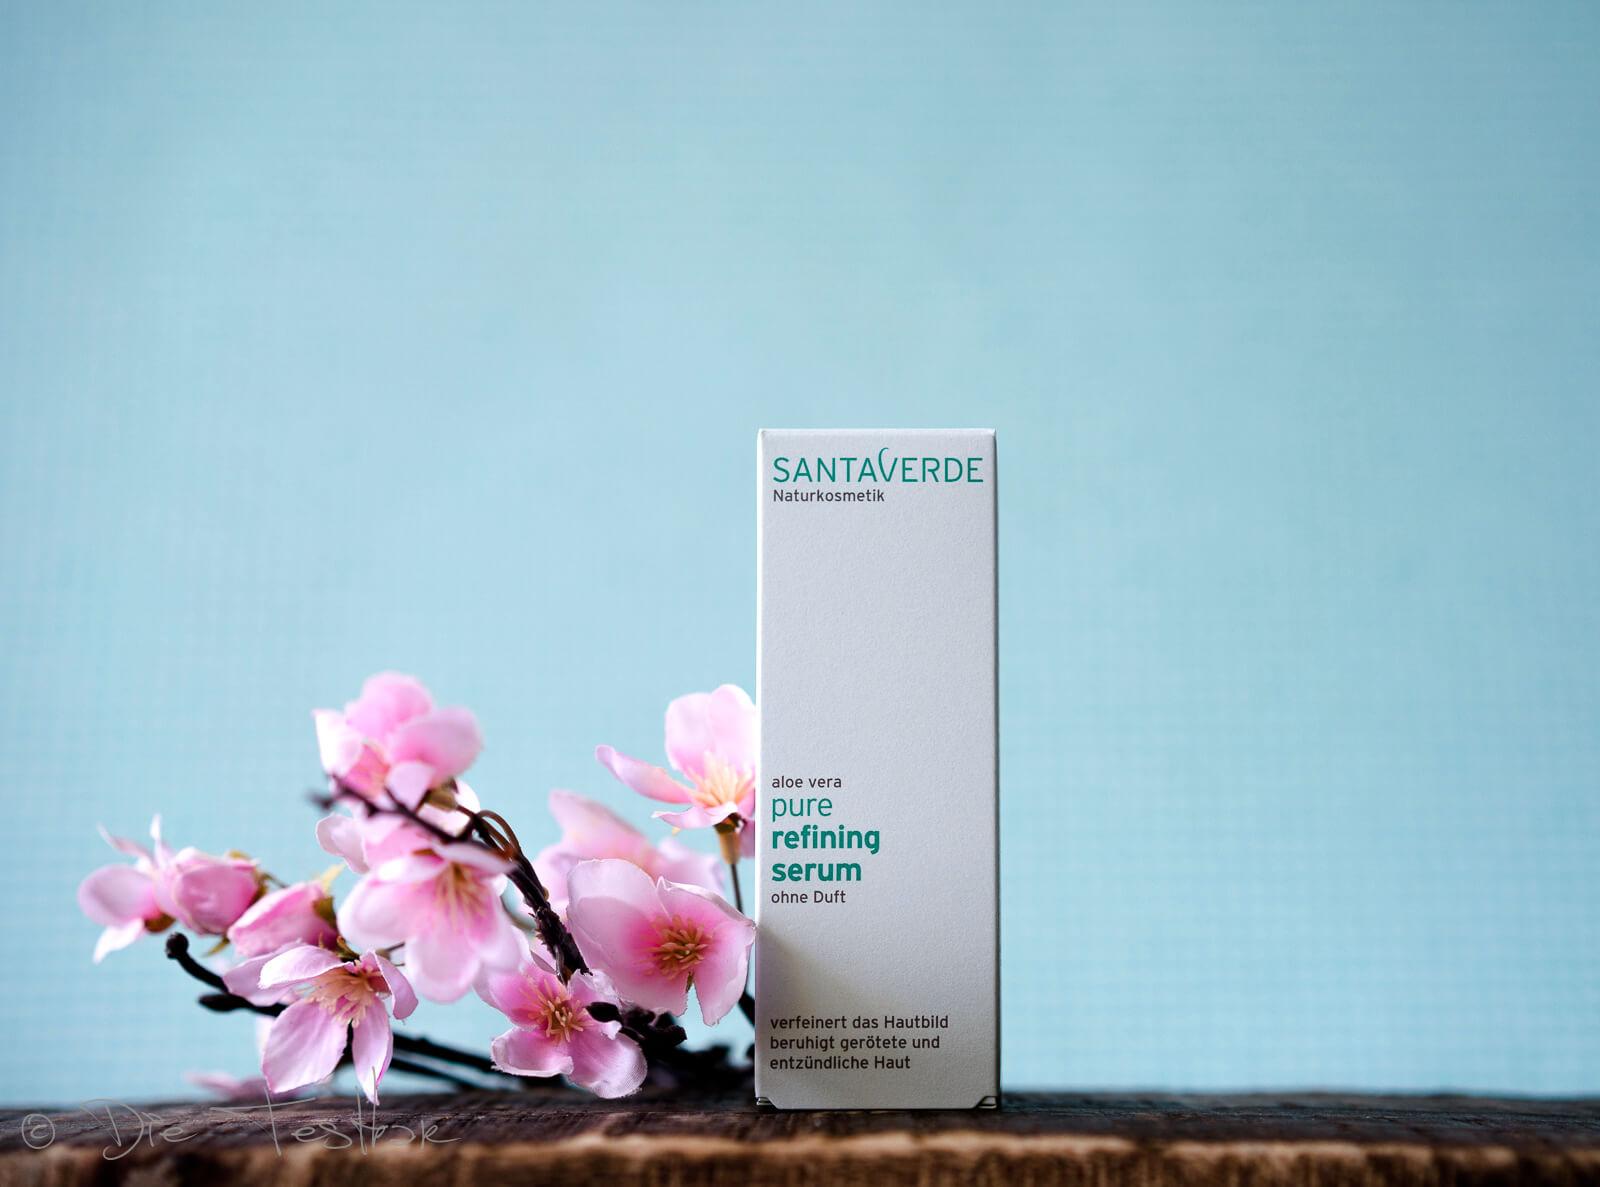 pure refining serum ohne Duft